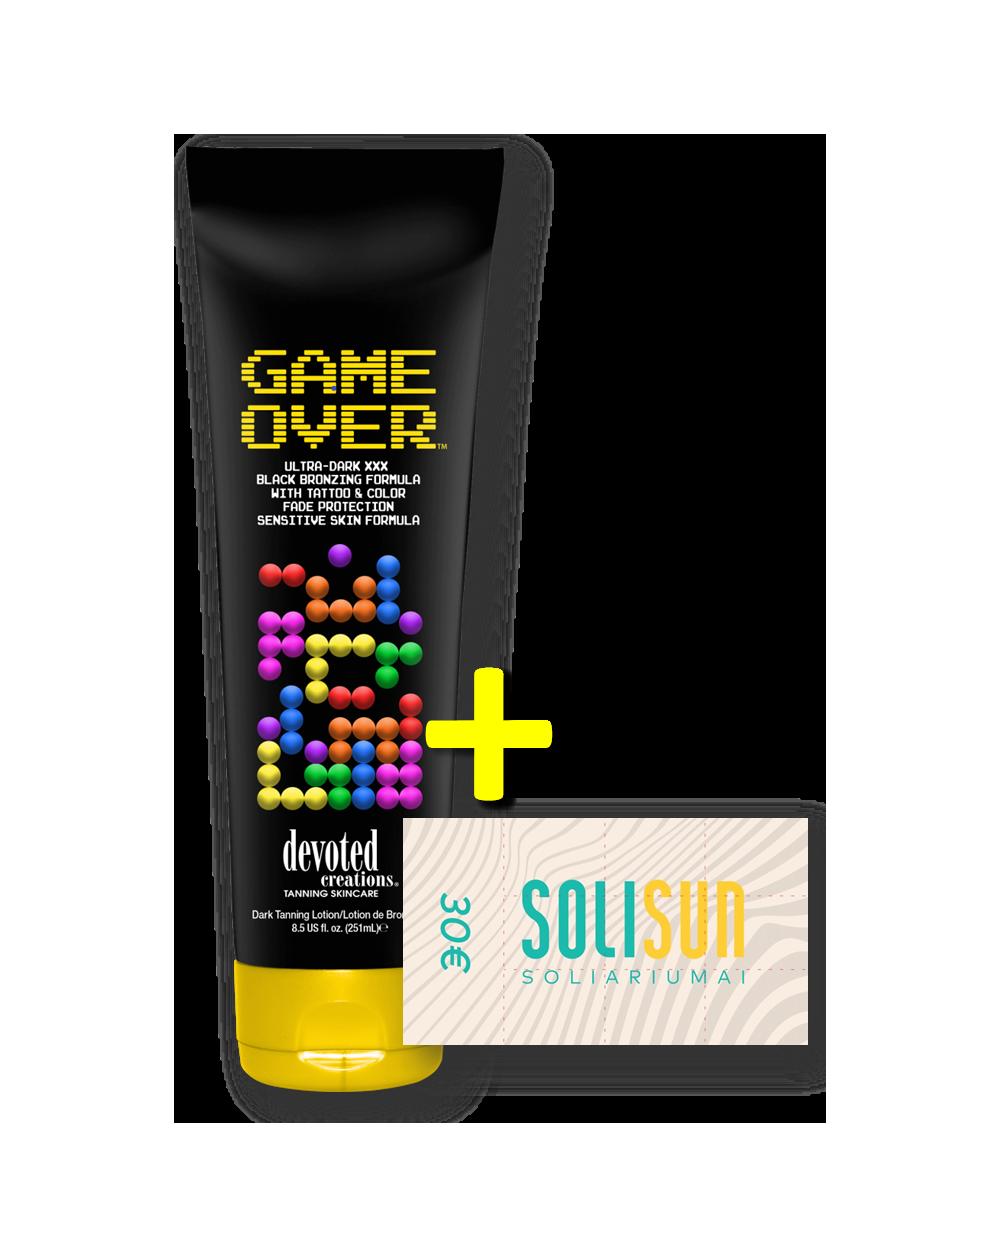 Game Over ™ + 30€ Solisun abonementas-Pagrindinis-Akcijos